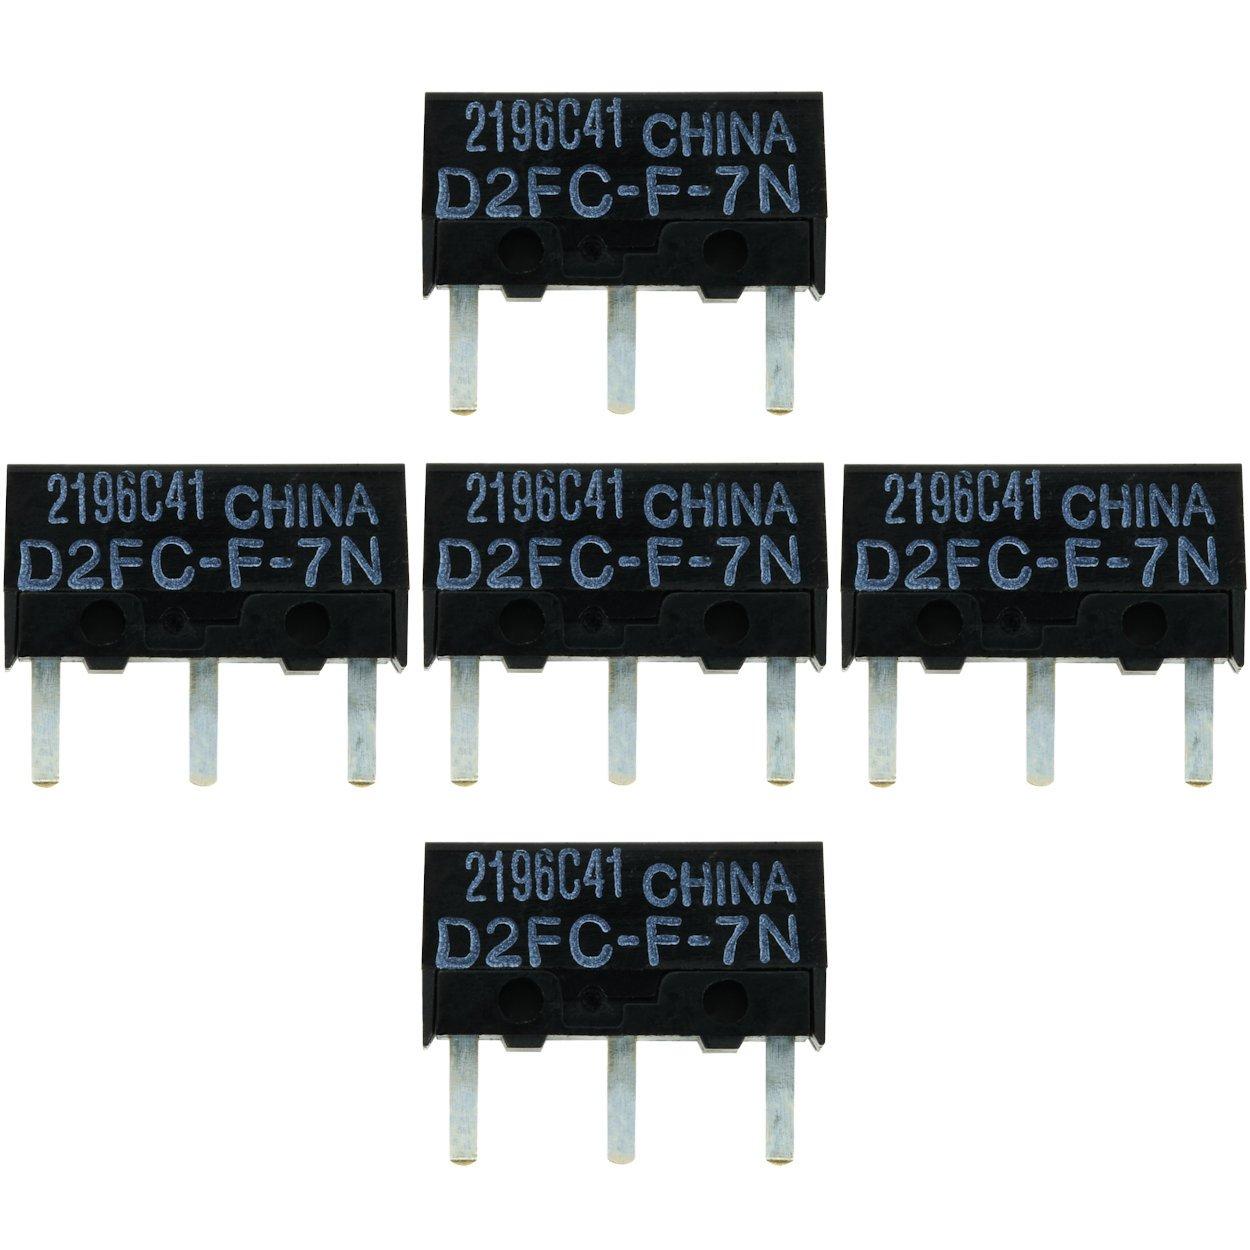 5x OMRON D2FC-F-7N (20M) Kit de Reparación de Microinterruptor / Kit de Reparación apropiado para mouse de computadora de Logitech, Razer, Roccat, ...